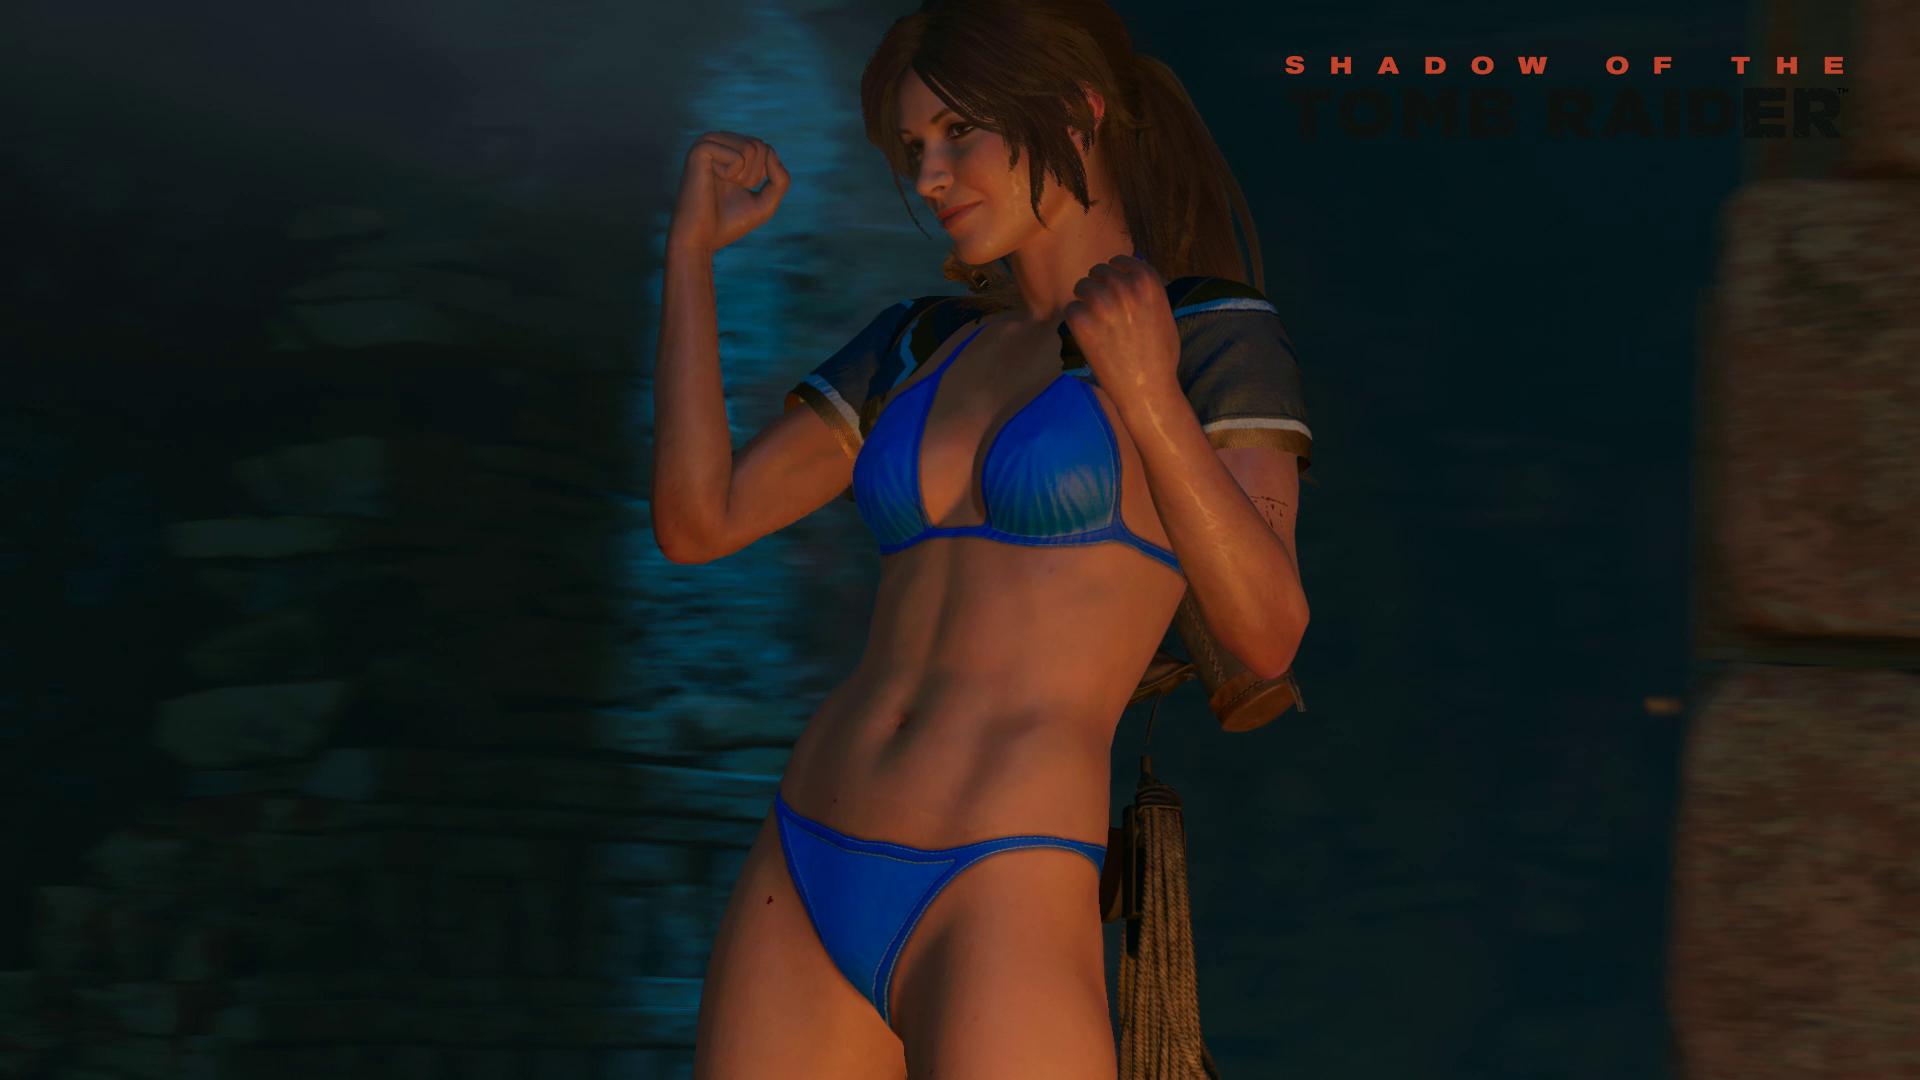 Lara Croft 10 at Shadow of the Tomb Raider Nexus - Mods